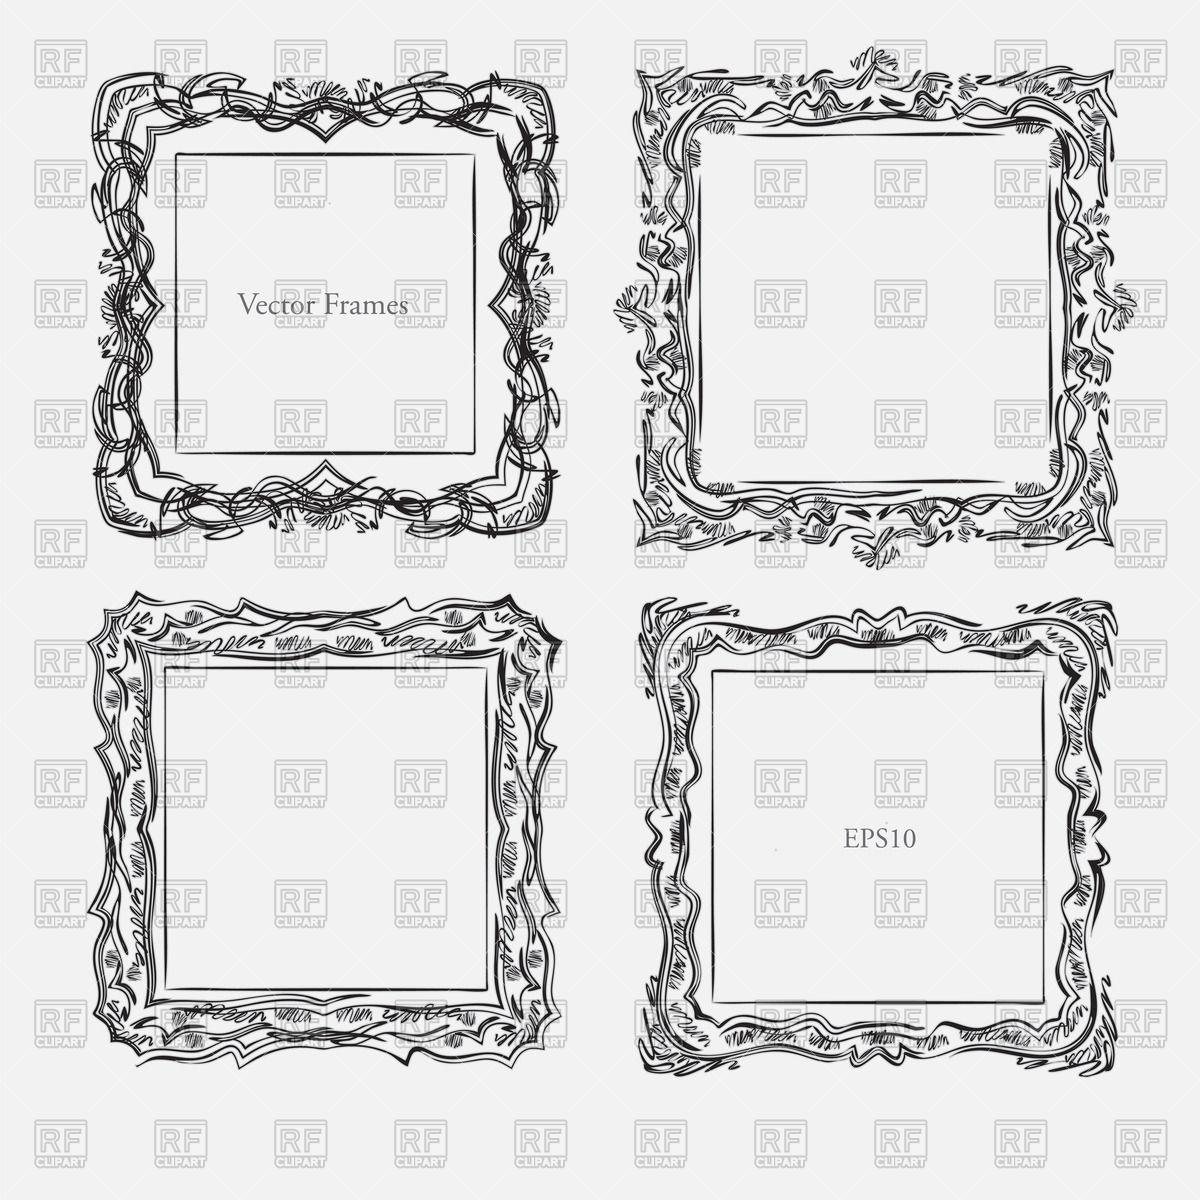 1200x1200 Antique Square Decorative Vintage Frame Vector Image Vector